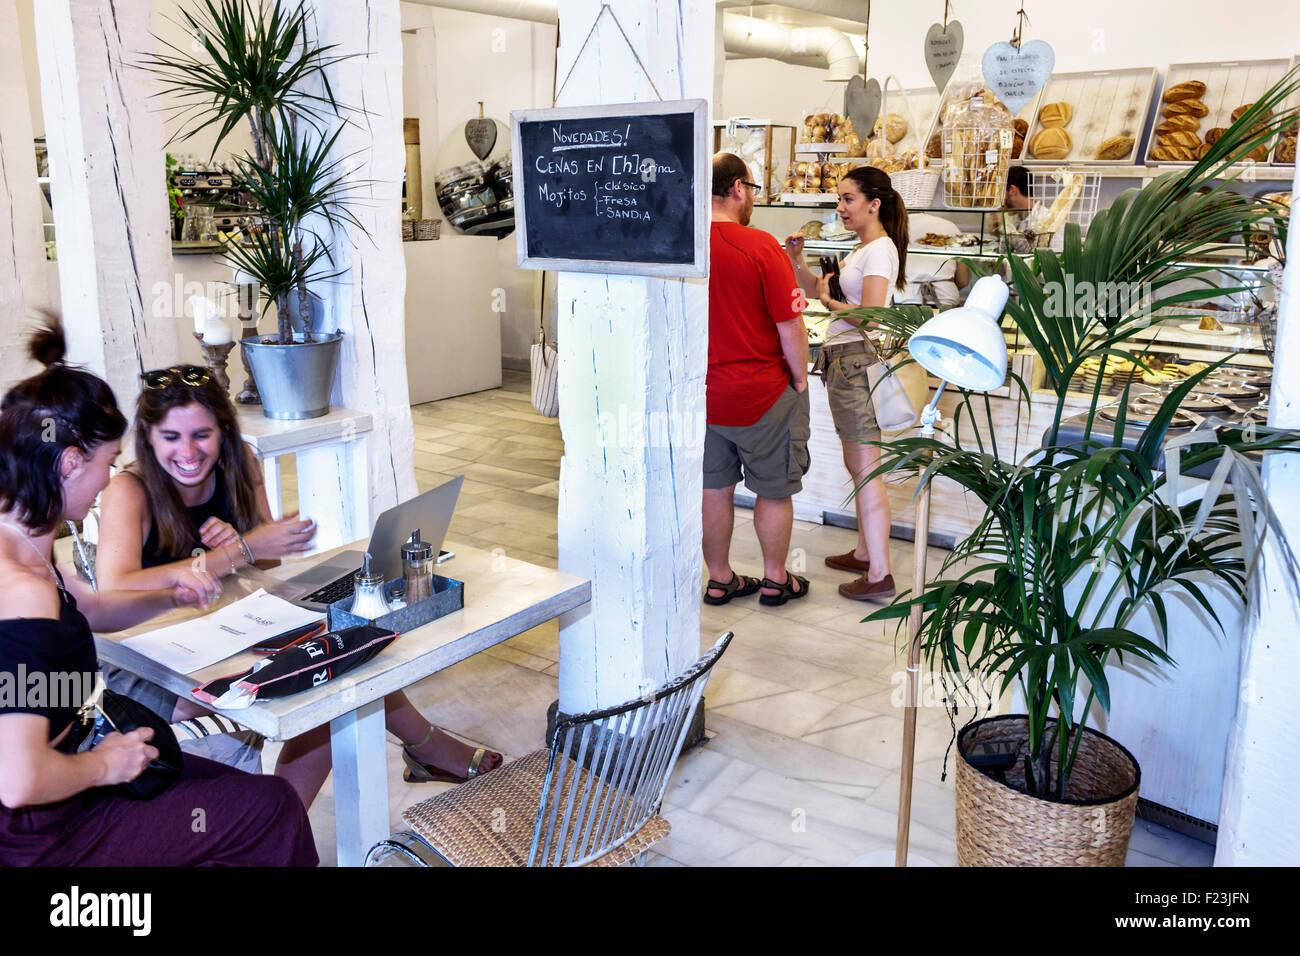 Madrid Spain Europe Spanish Retiro Plaza de la Independencia Harina [H]arina cafe bakery restaurant inside interior - Stock Image